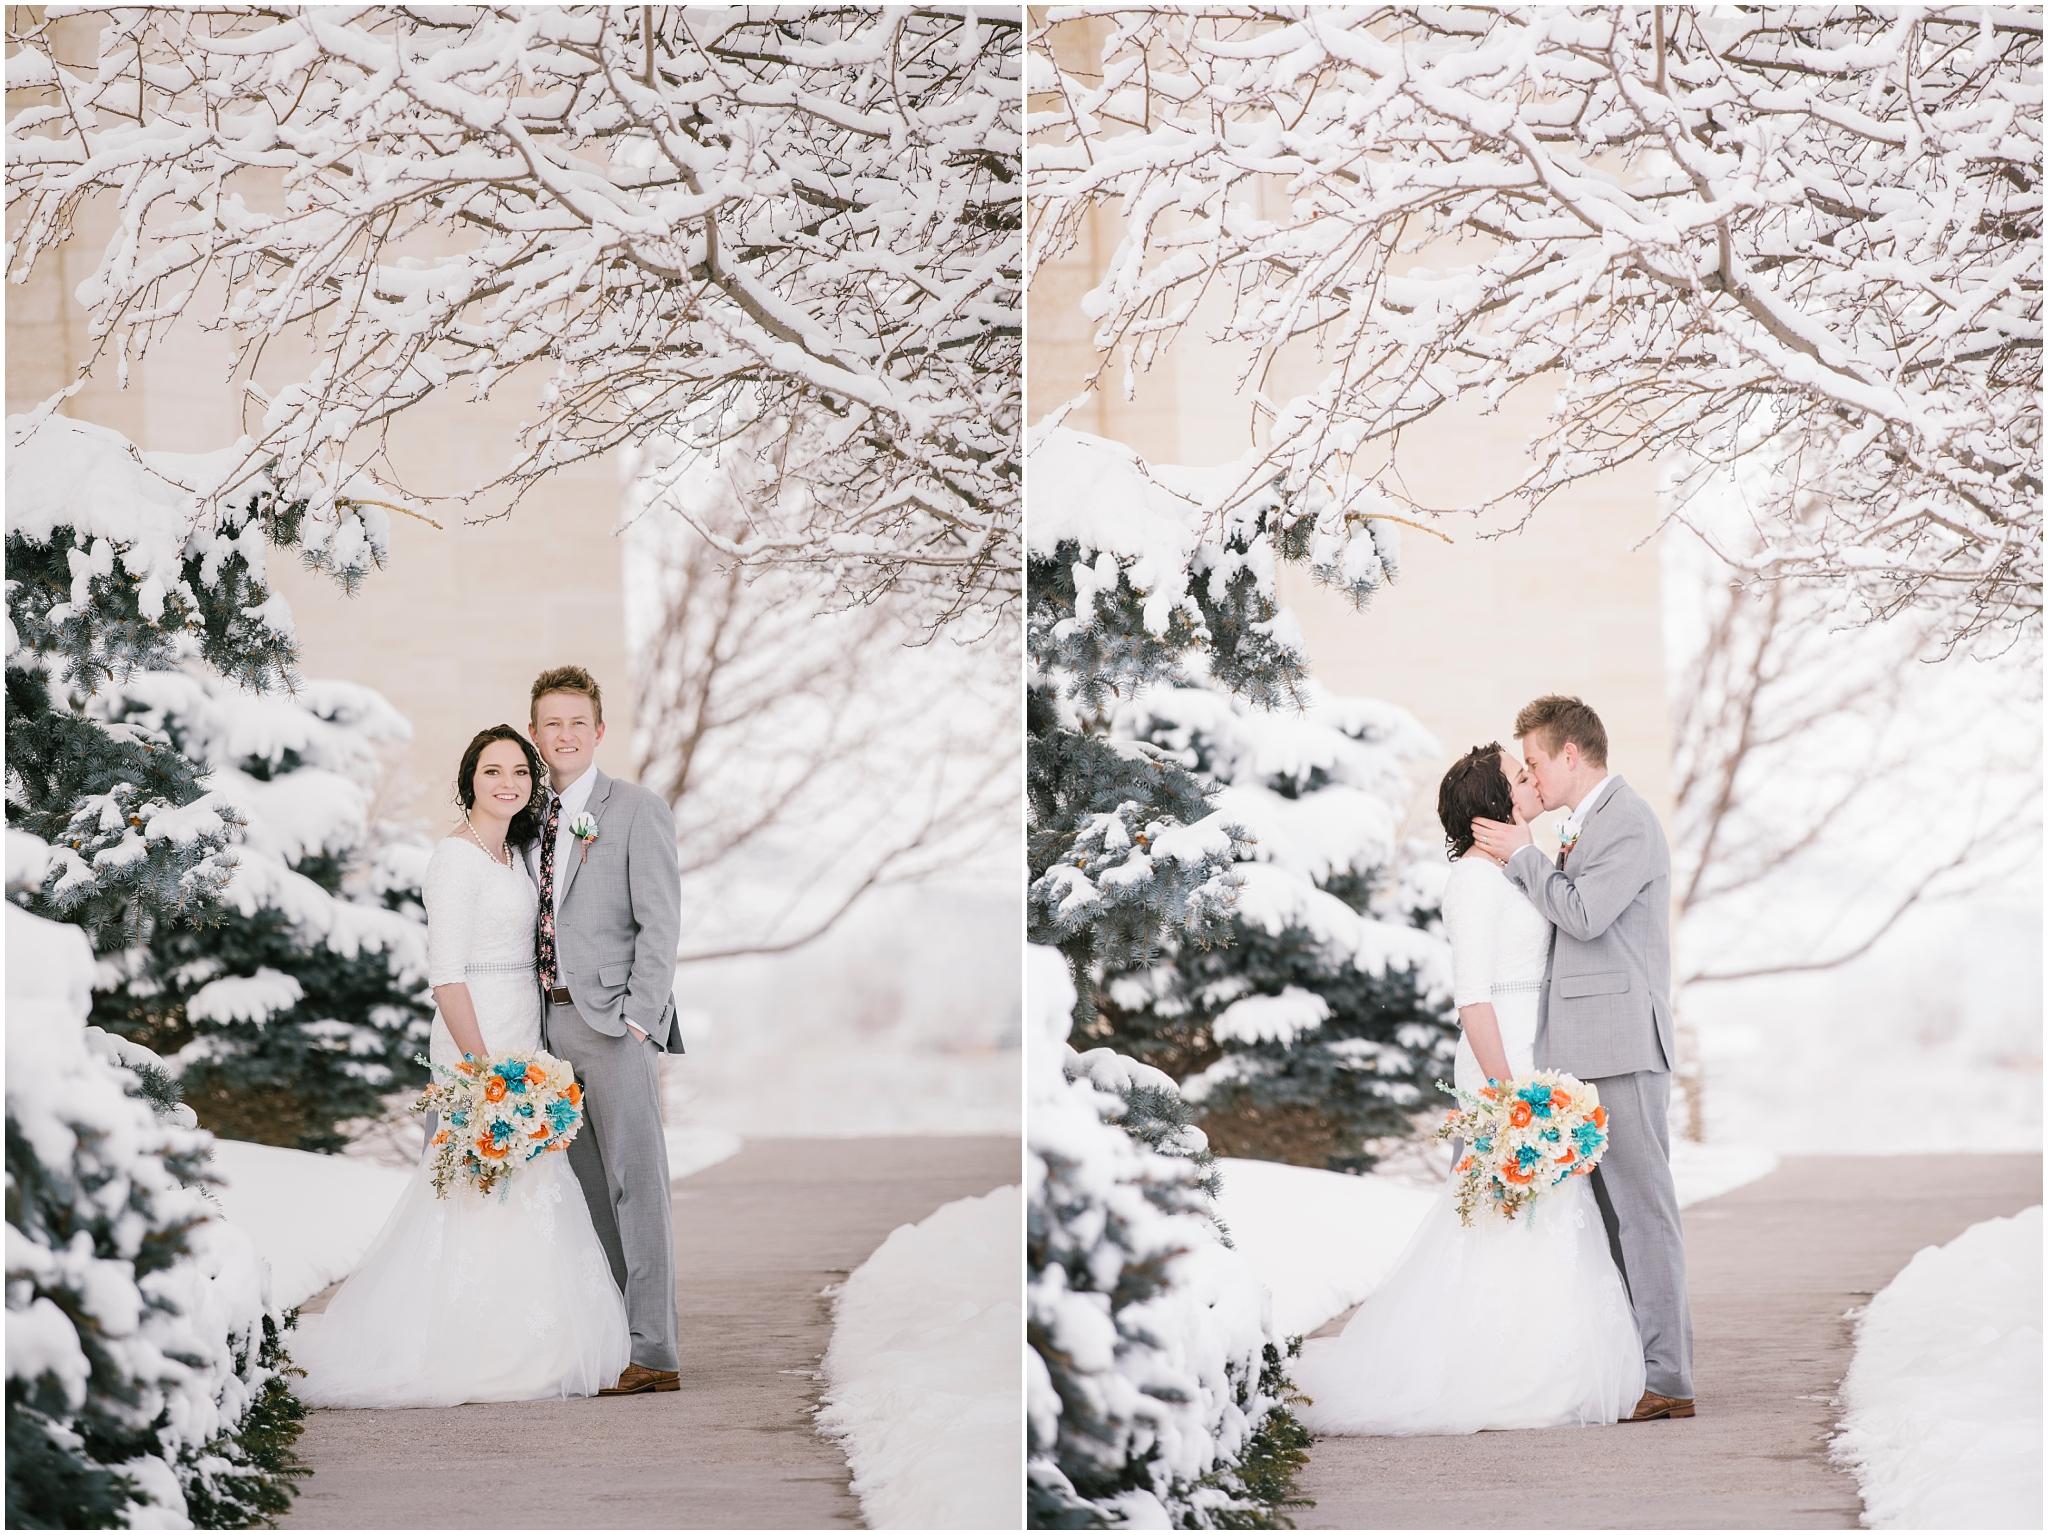 Bo Alyssa Wedding-121_Lizzie-B-Imagery-Utah-Wedding-Photographer-Central-Utah-Photographer-Utah-County-Manti-Temple.jpg